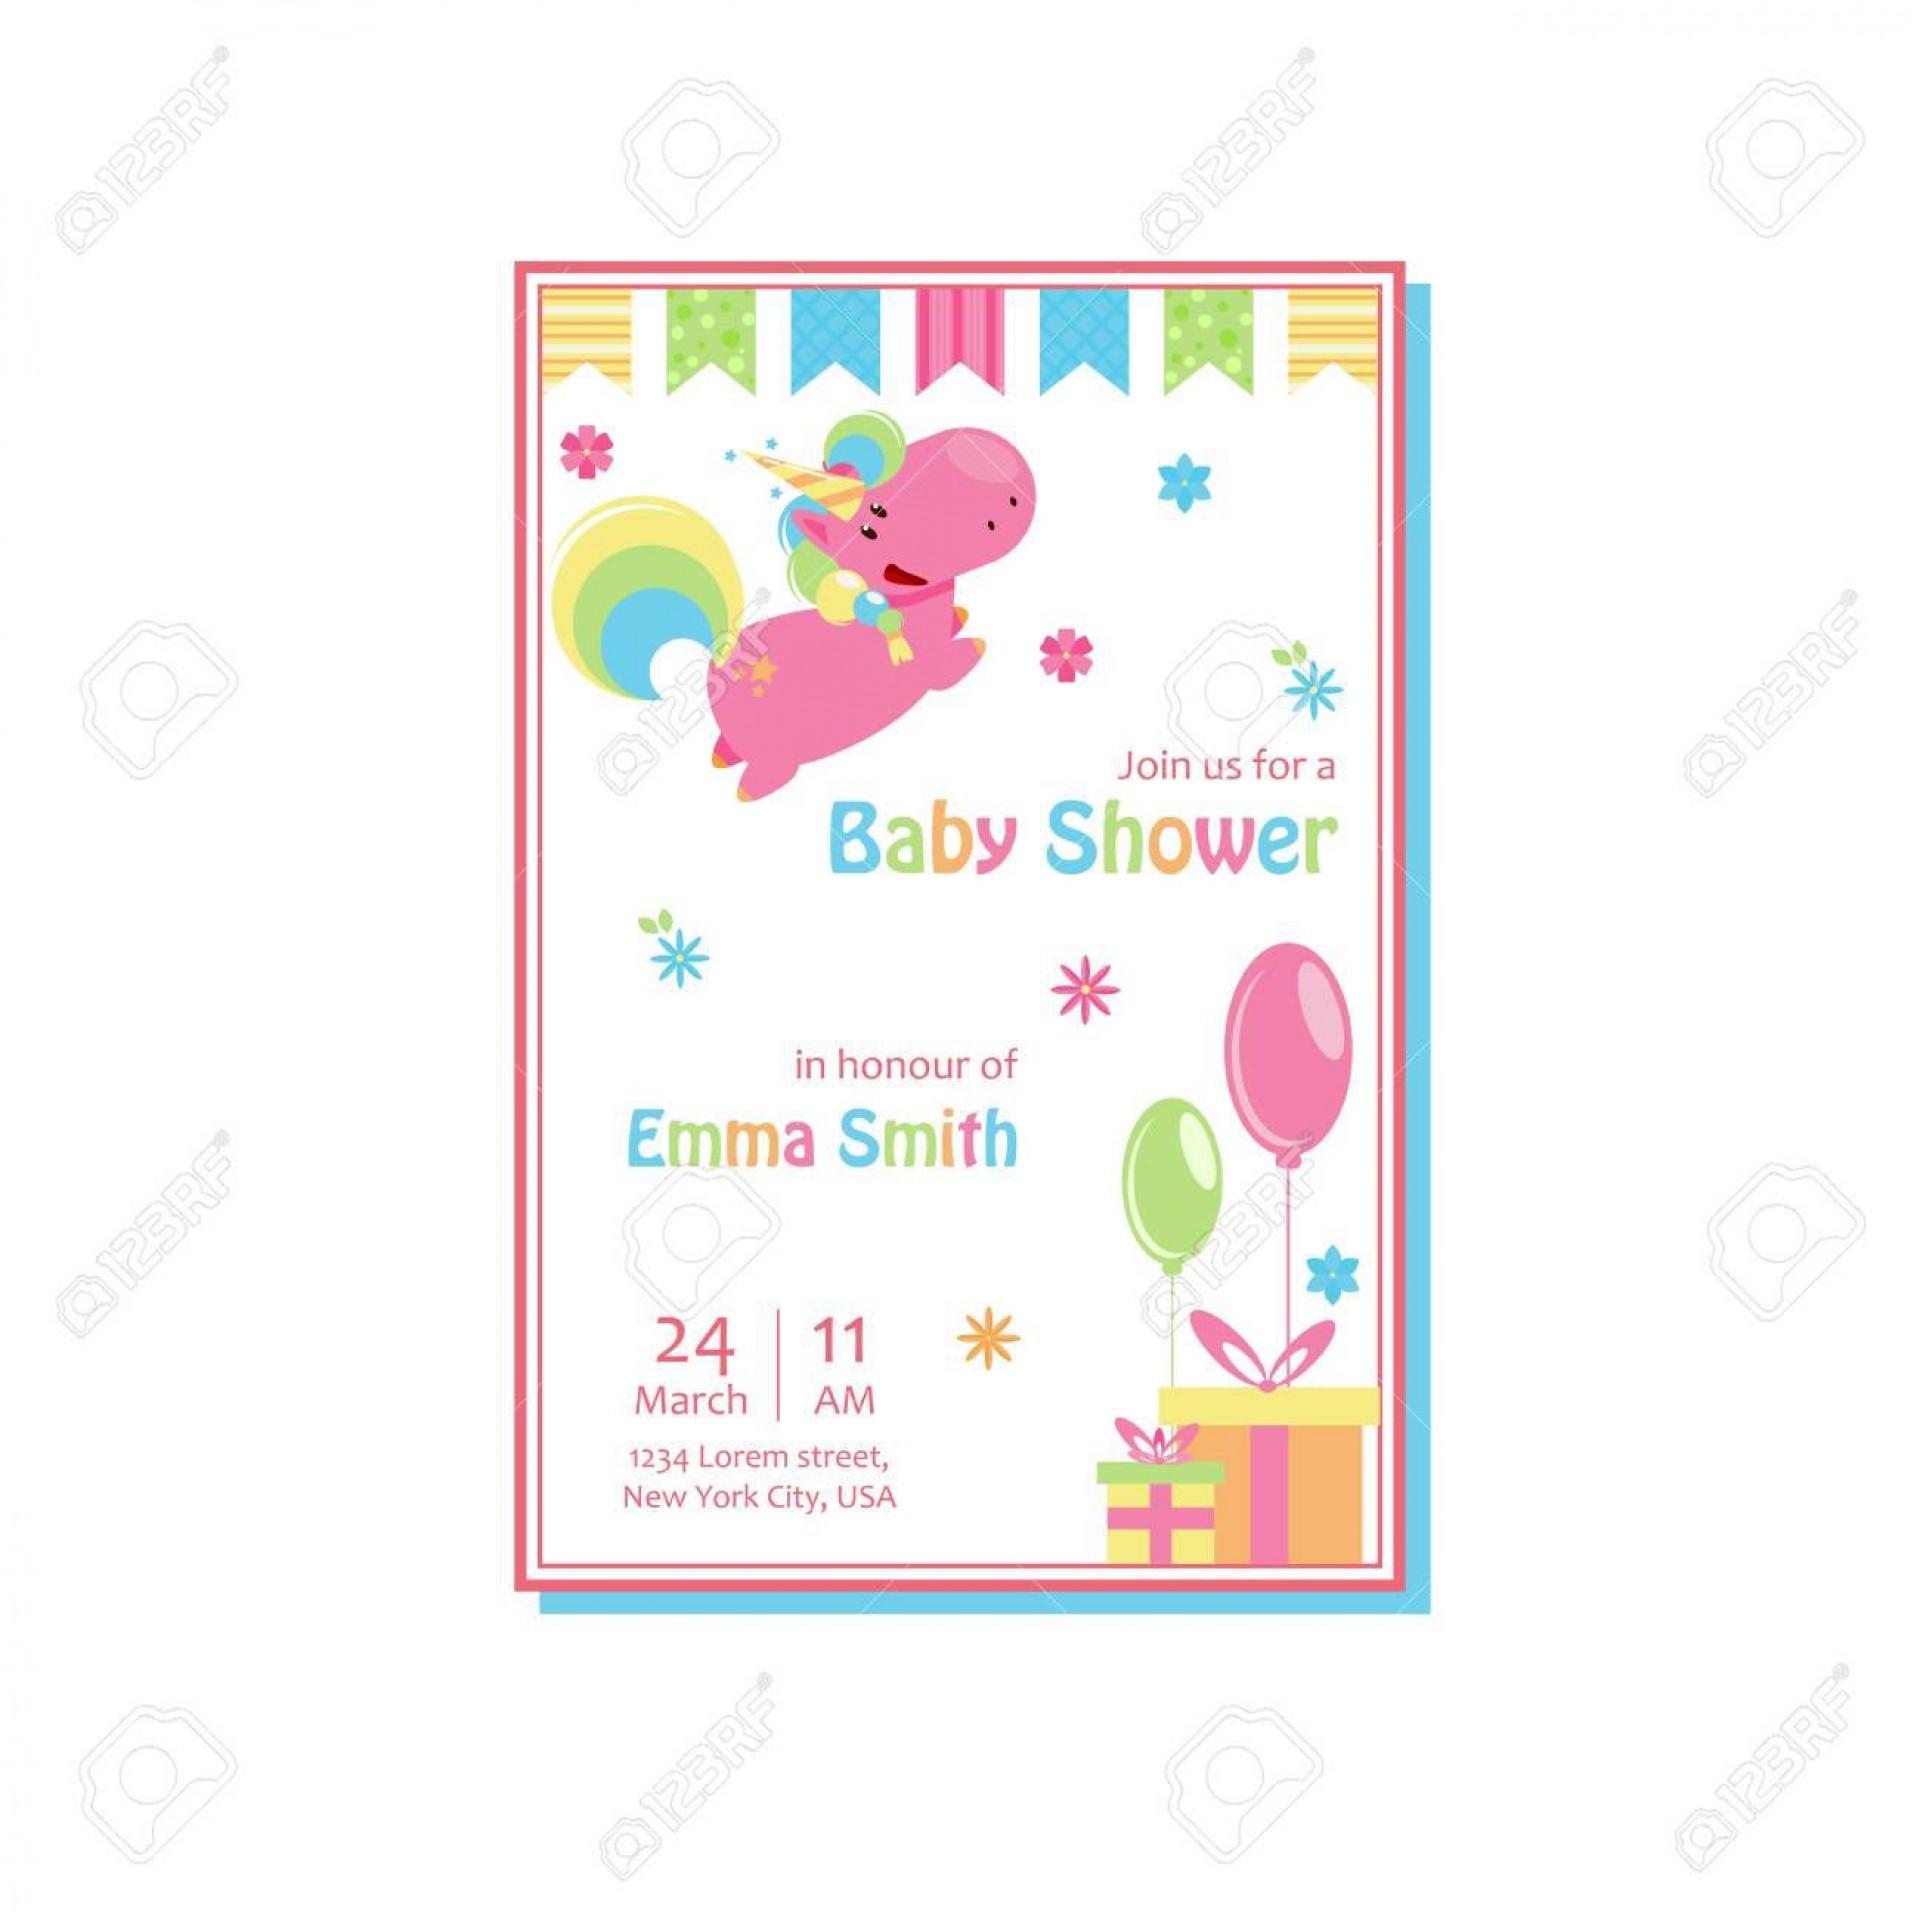 005 Impressive Baby Shower Card Template Sample  Microsoft Word Invitation Design Online Printable Free1920